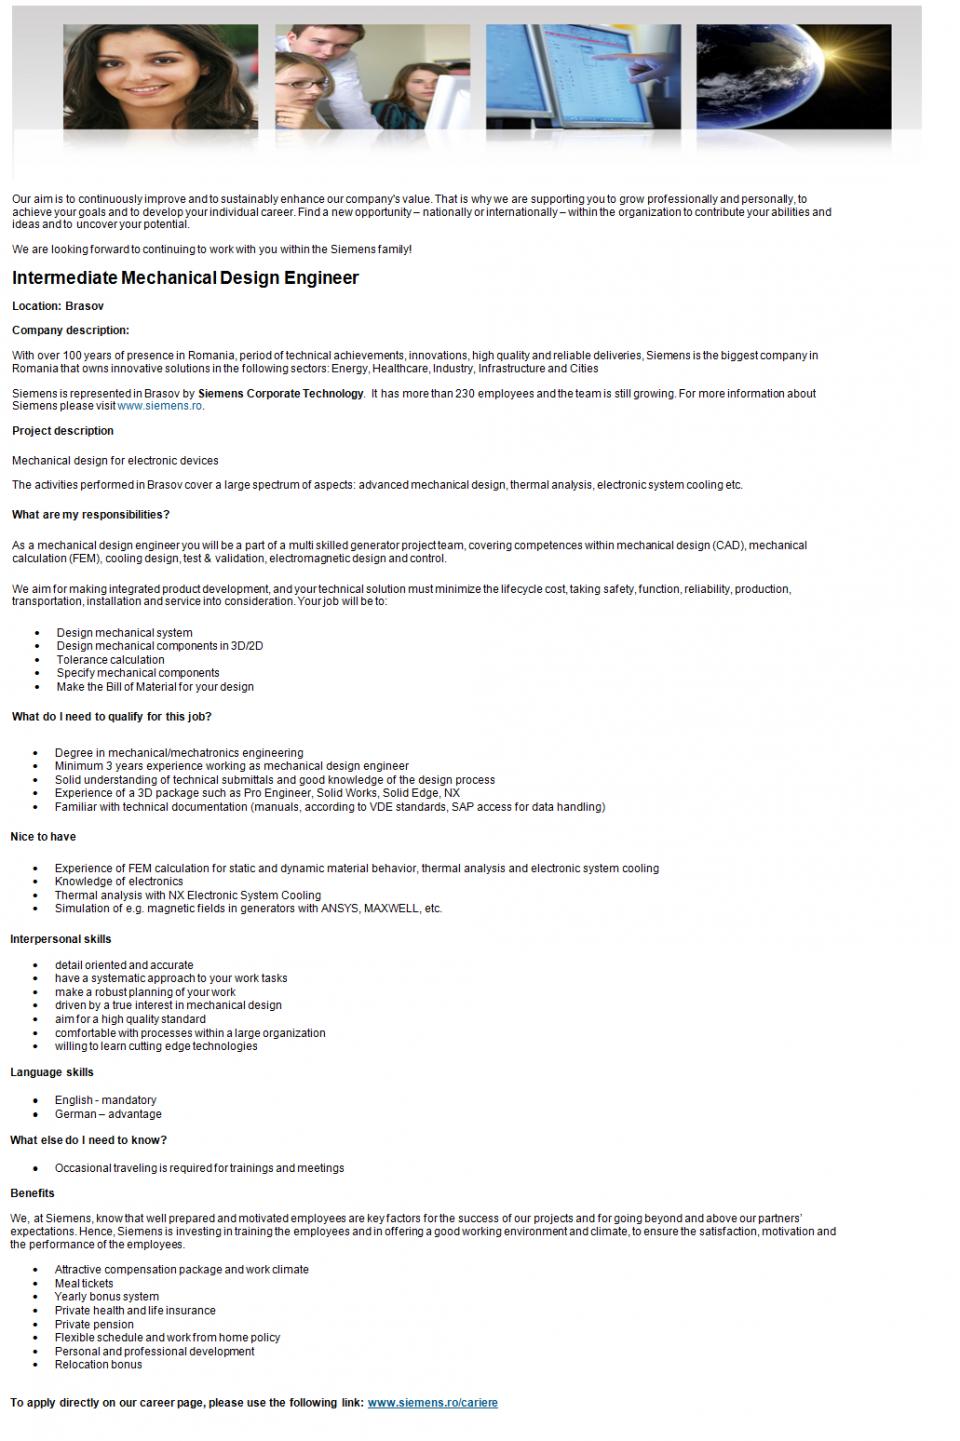 Intermediate Mechanical Design Engineer